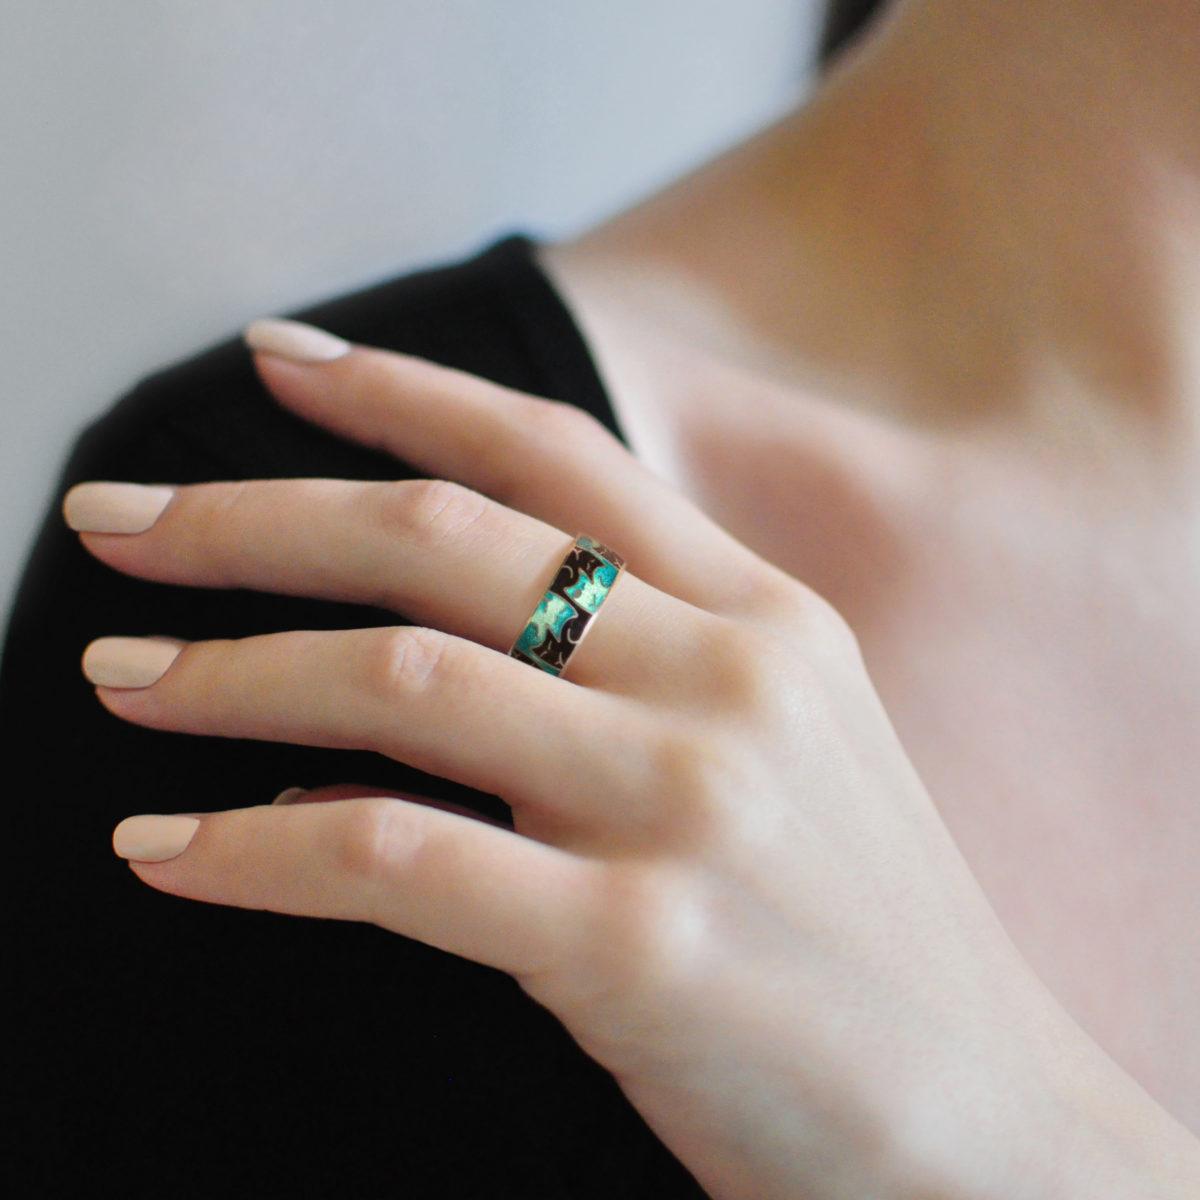 Serebro fioletovo zelenaya 2 1200x1200 - Кольцо из серебра «Котики Инь-Ян», зеленая